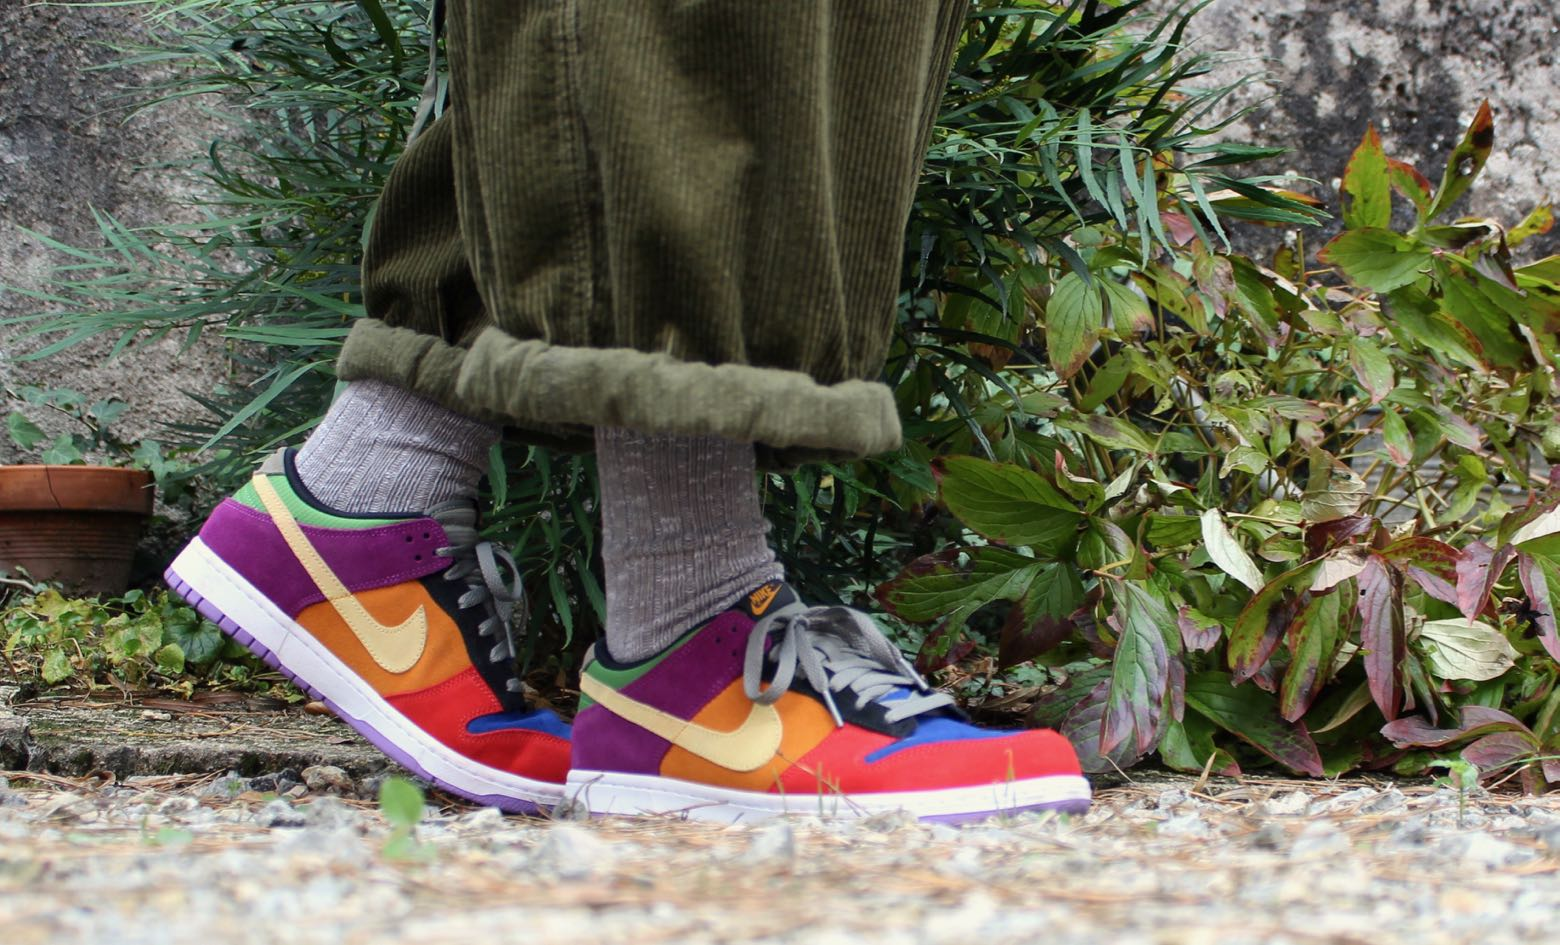 Nike Dunk viotech sneakers rares